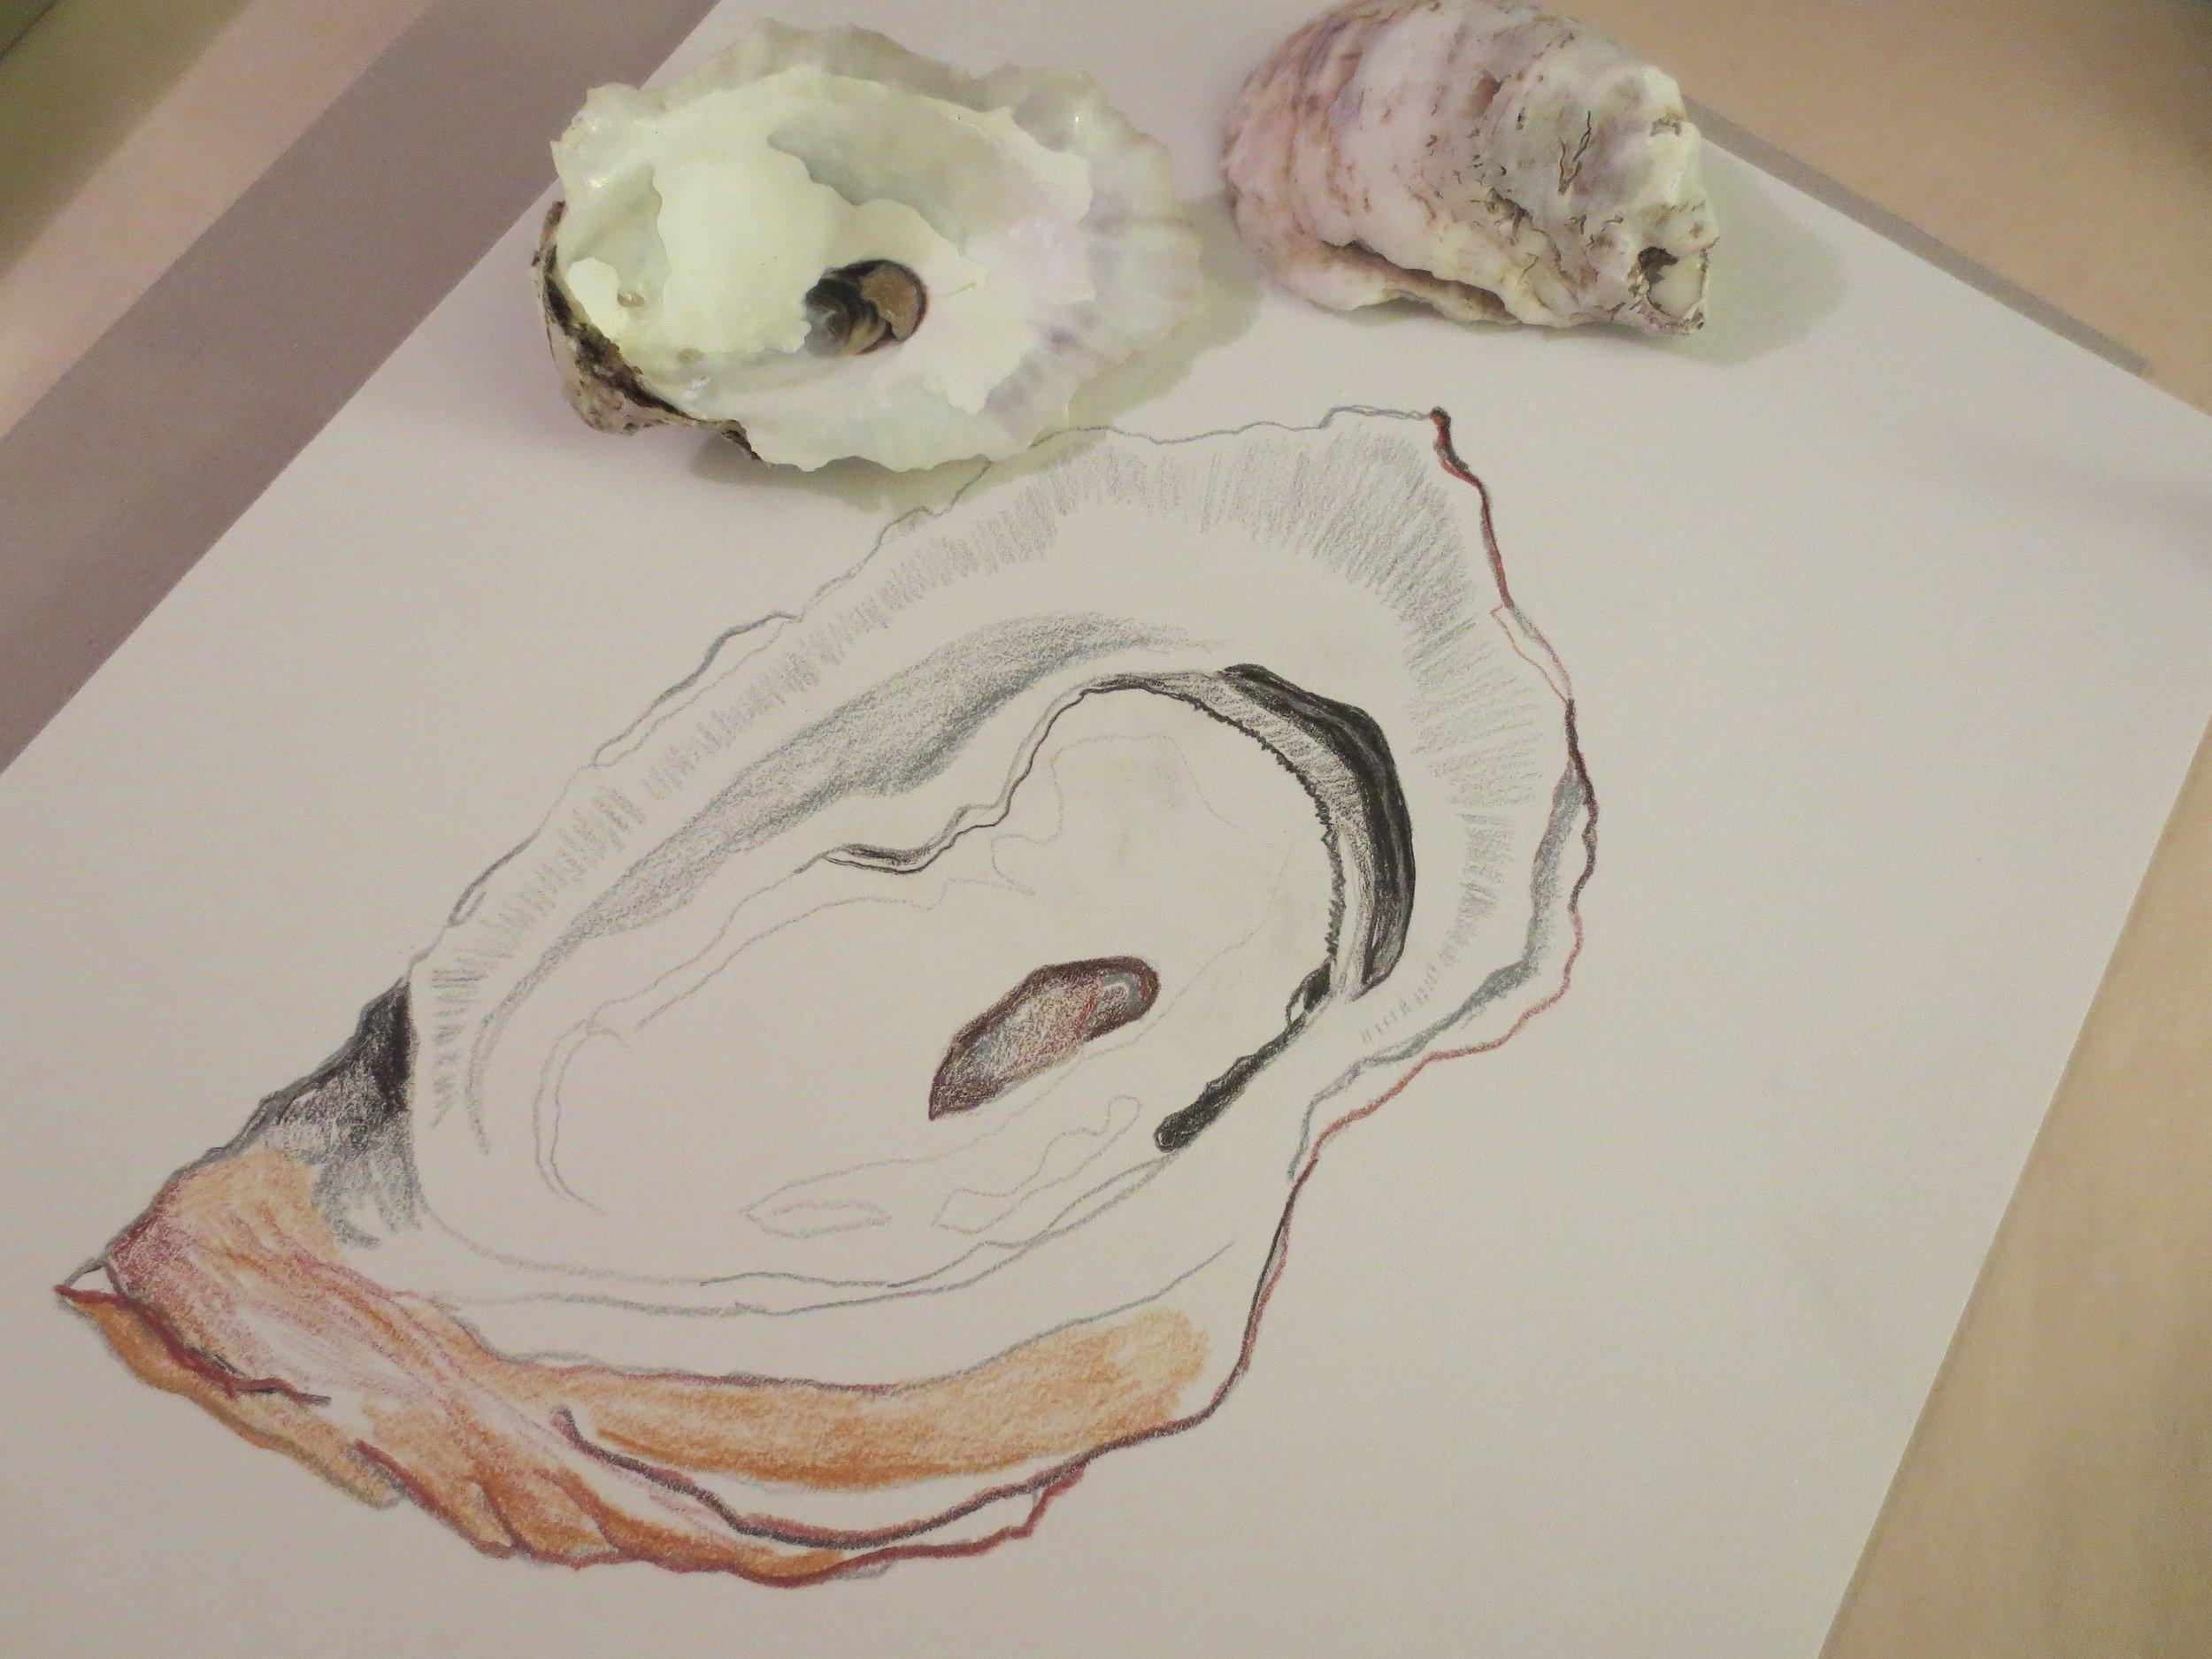 Oyster Study In Progress